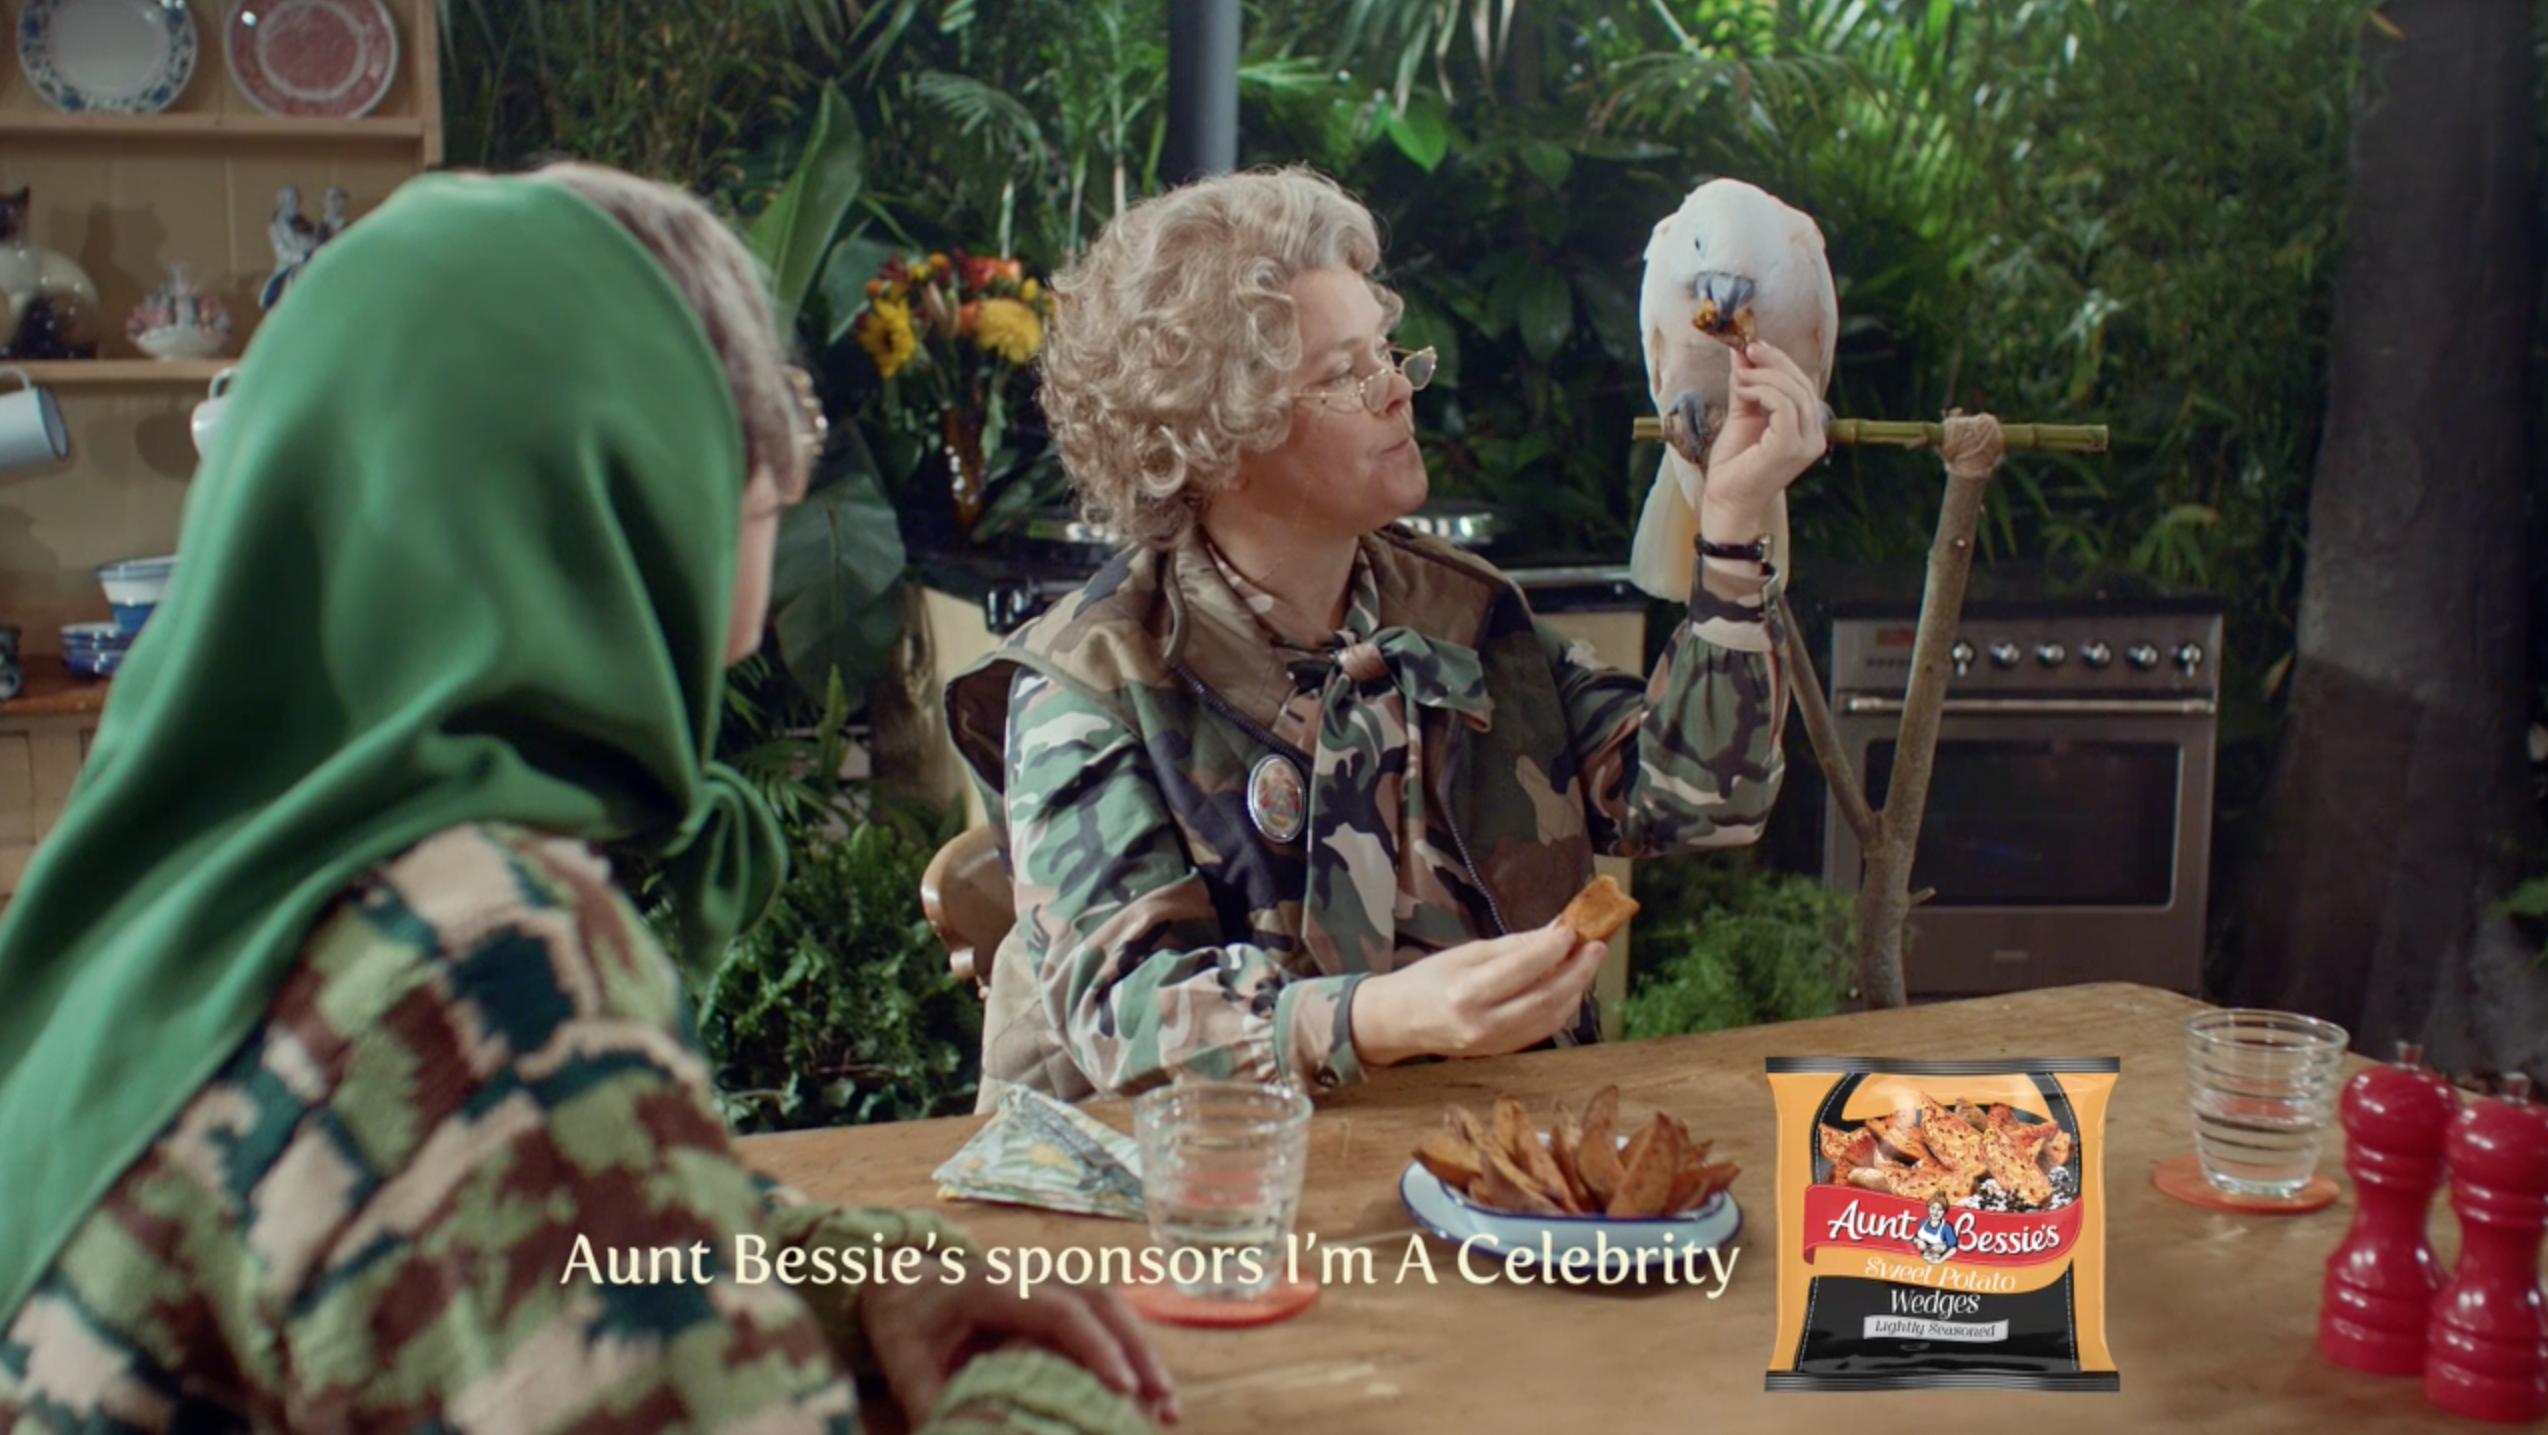 St Luke's Creates New Idents for Aunt Bessie's Sponsorship of I'm a Celeb